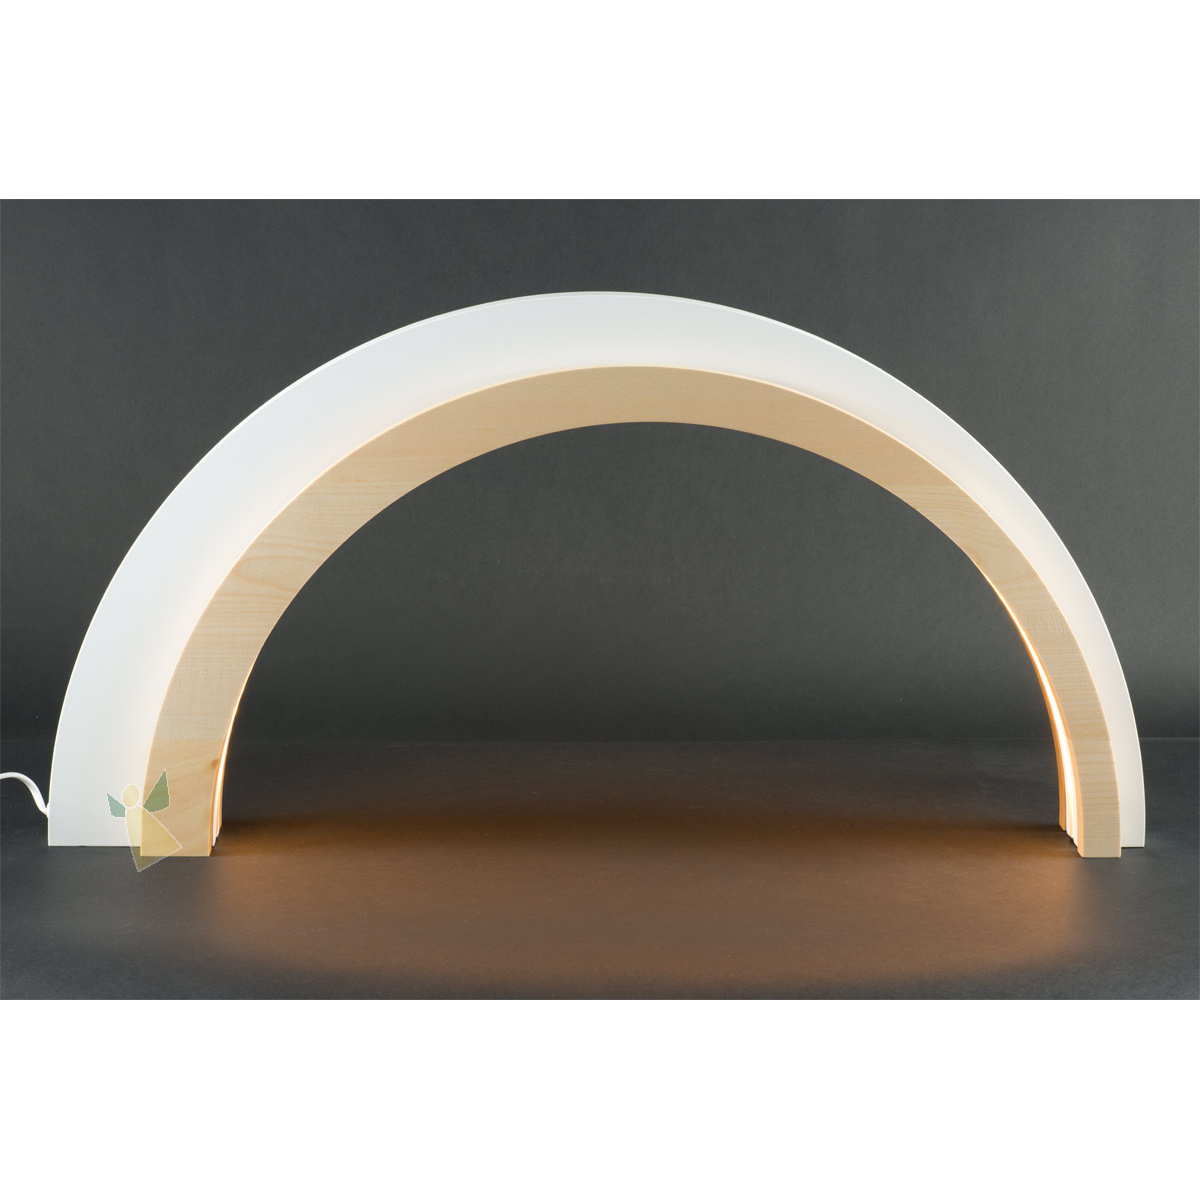 schwibbogen led beleuchtung natur von n umanns f r 455 kaufen. Black Bedroom Furniture Sets. Home Design Ideas